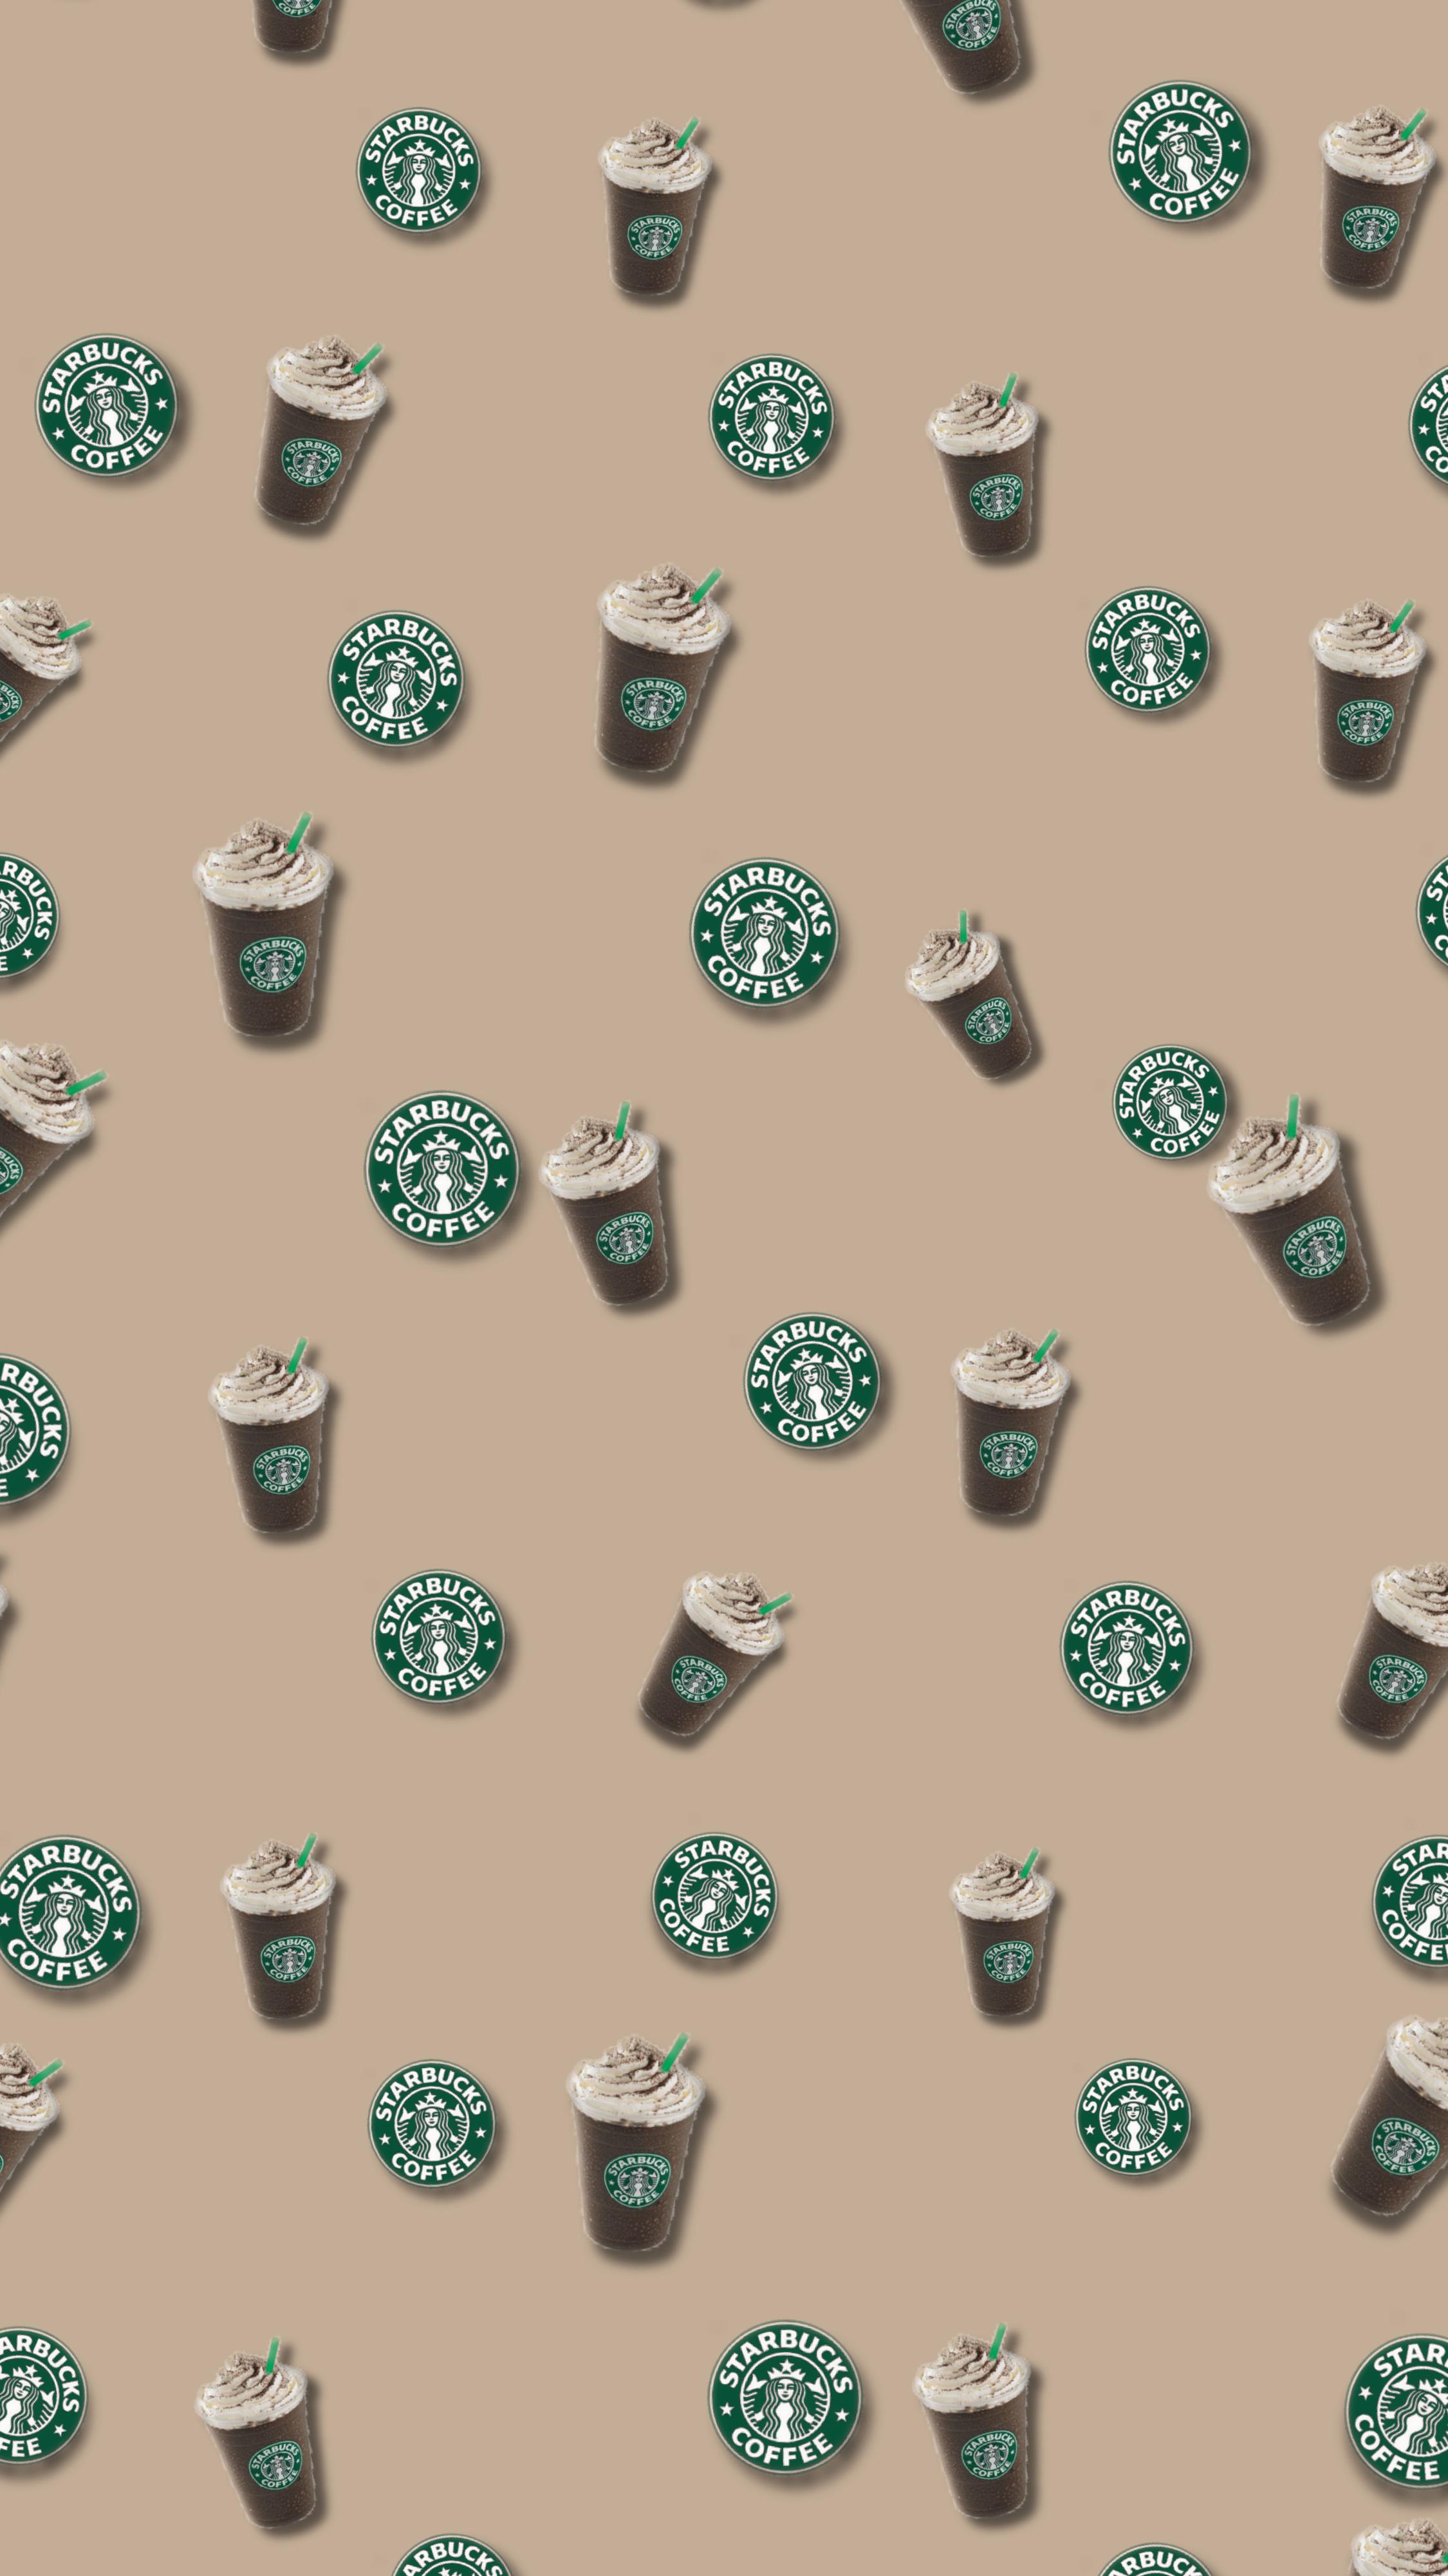 Pin By Juan Felipe On Wallpapers Starbucks Wallpaper Coffee Wallpaper Iphone Coffee Wallpaper